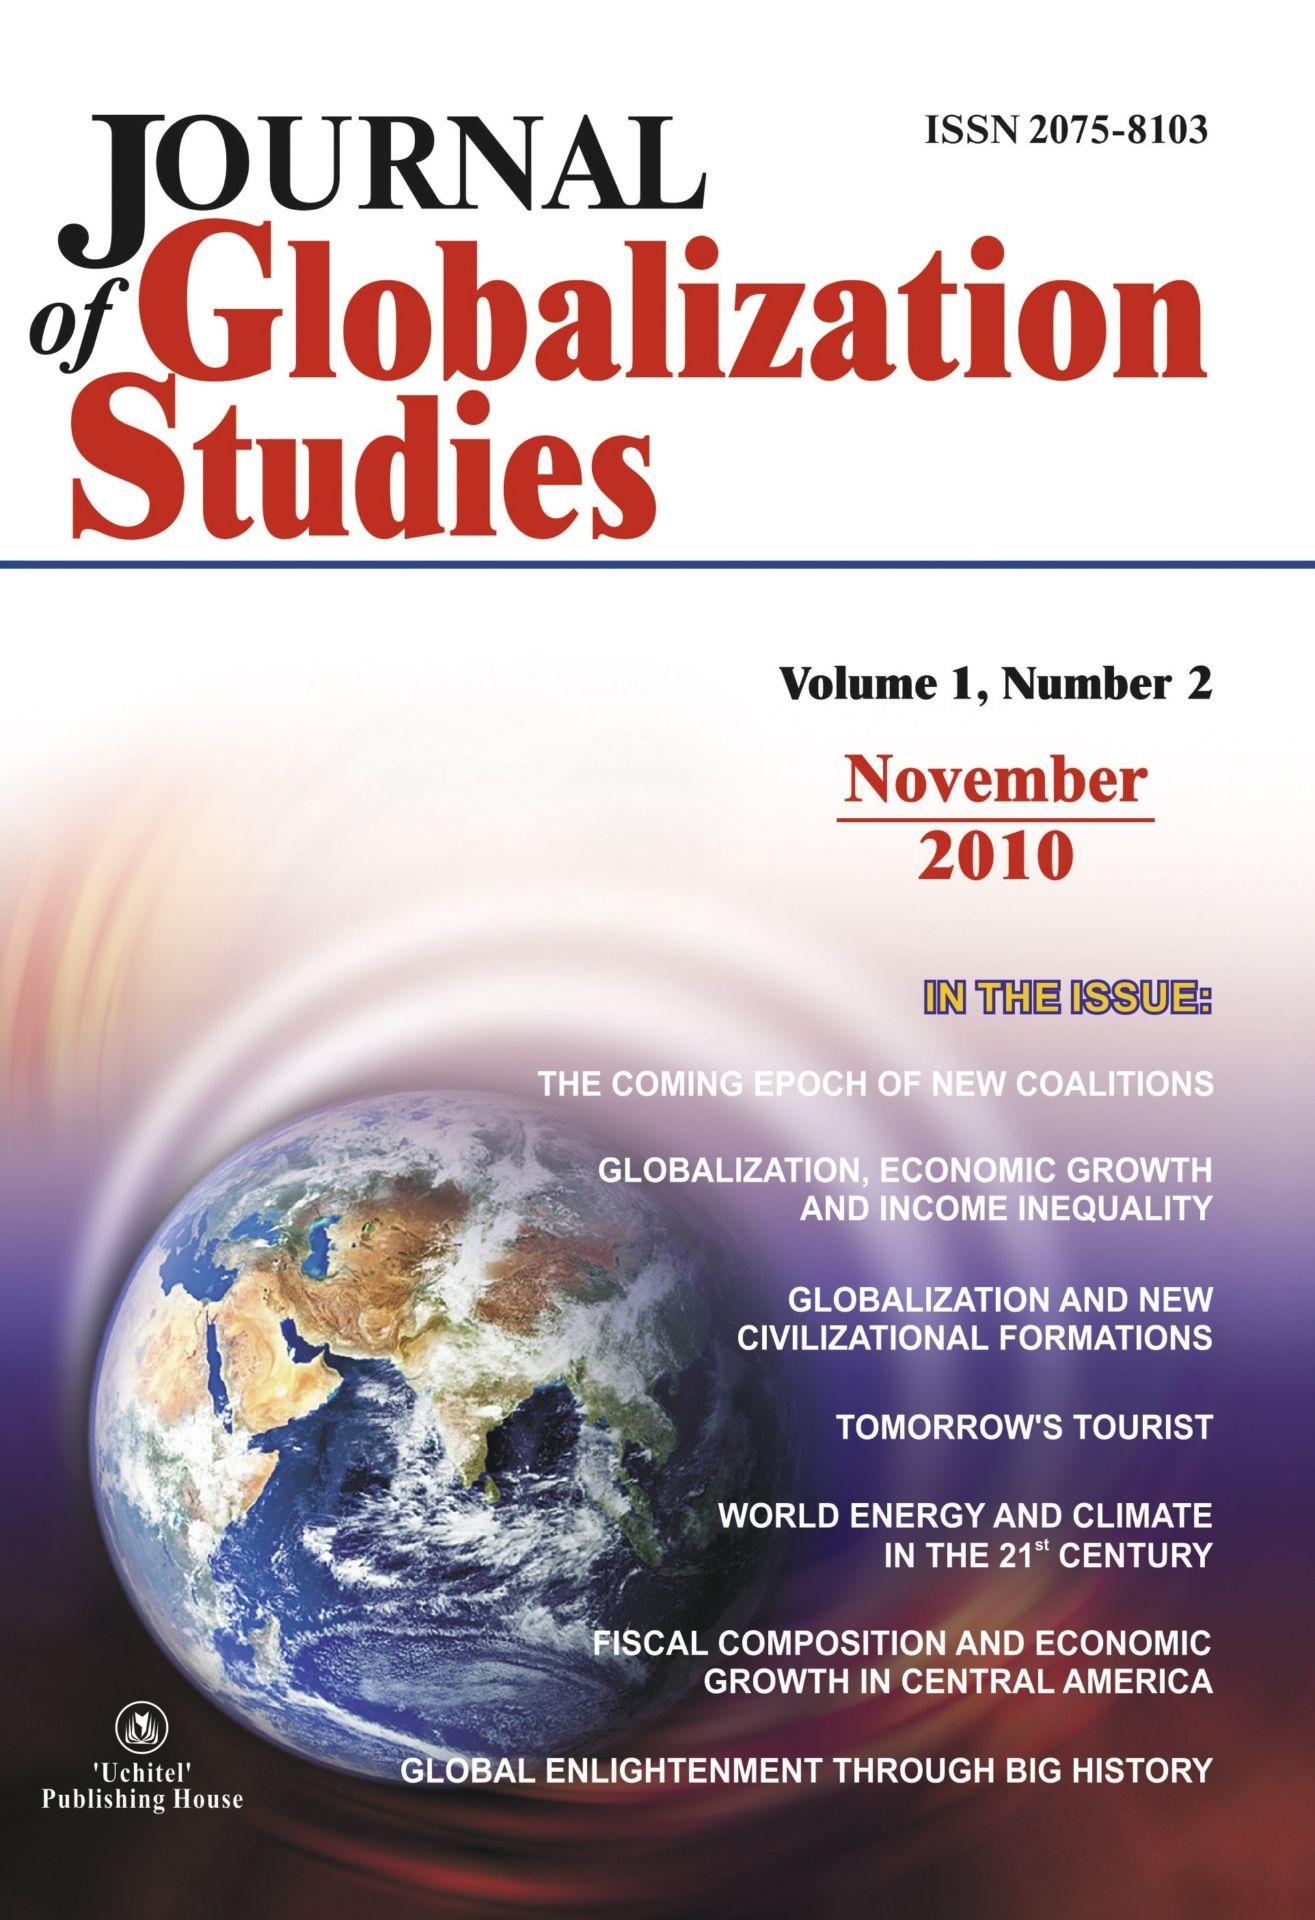 Journal of Globalization Studies Volume 1, Number 2, 2010 г. Журнал глобализационных исследований Международный журнал на английском языке.